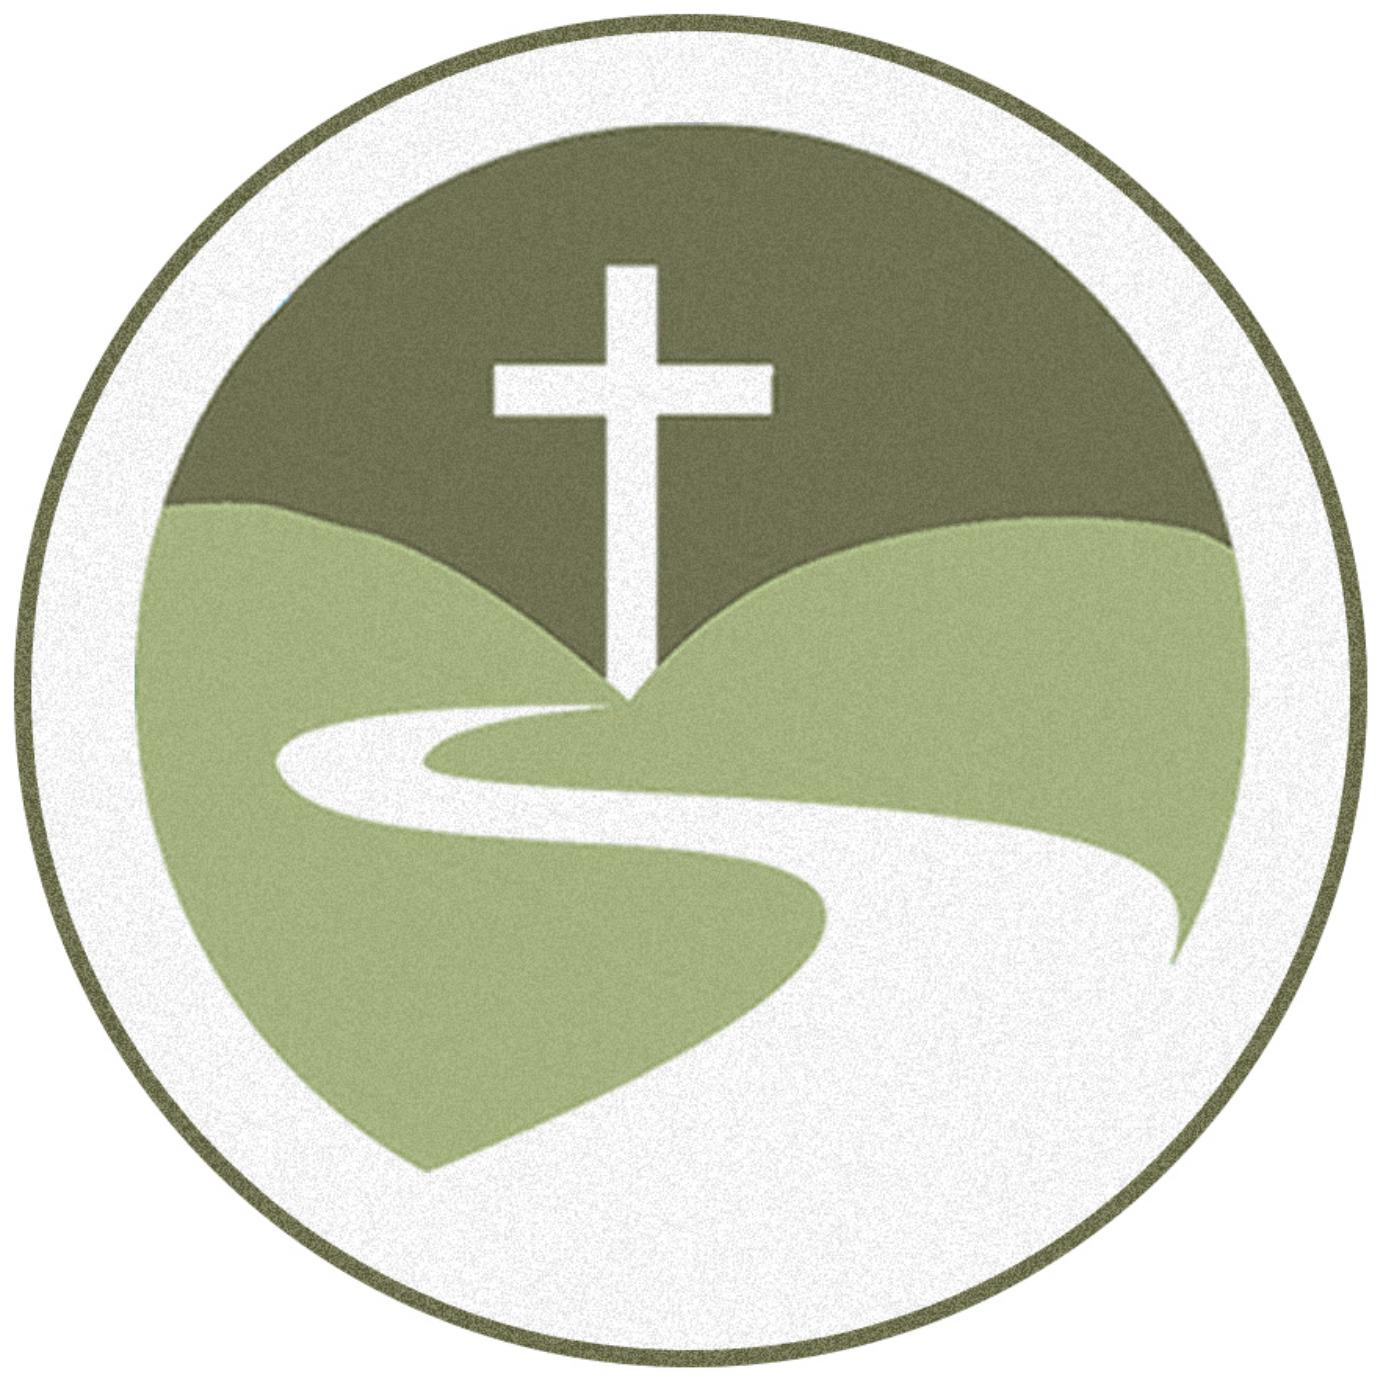 Valley Creek Baptist Church